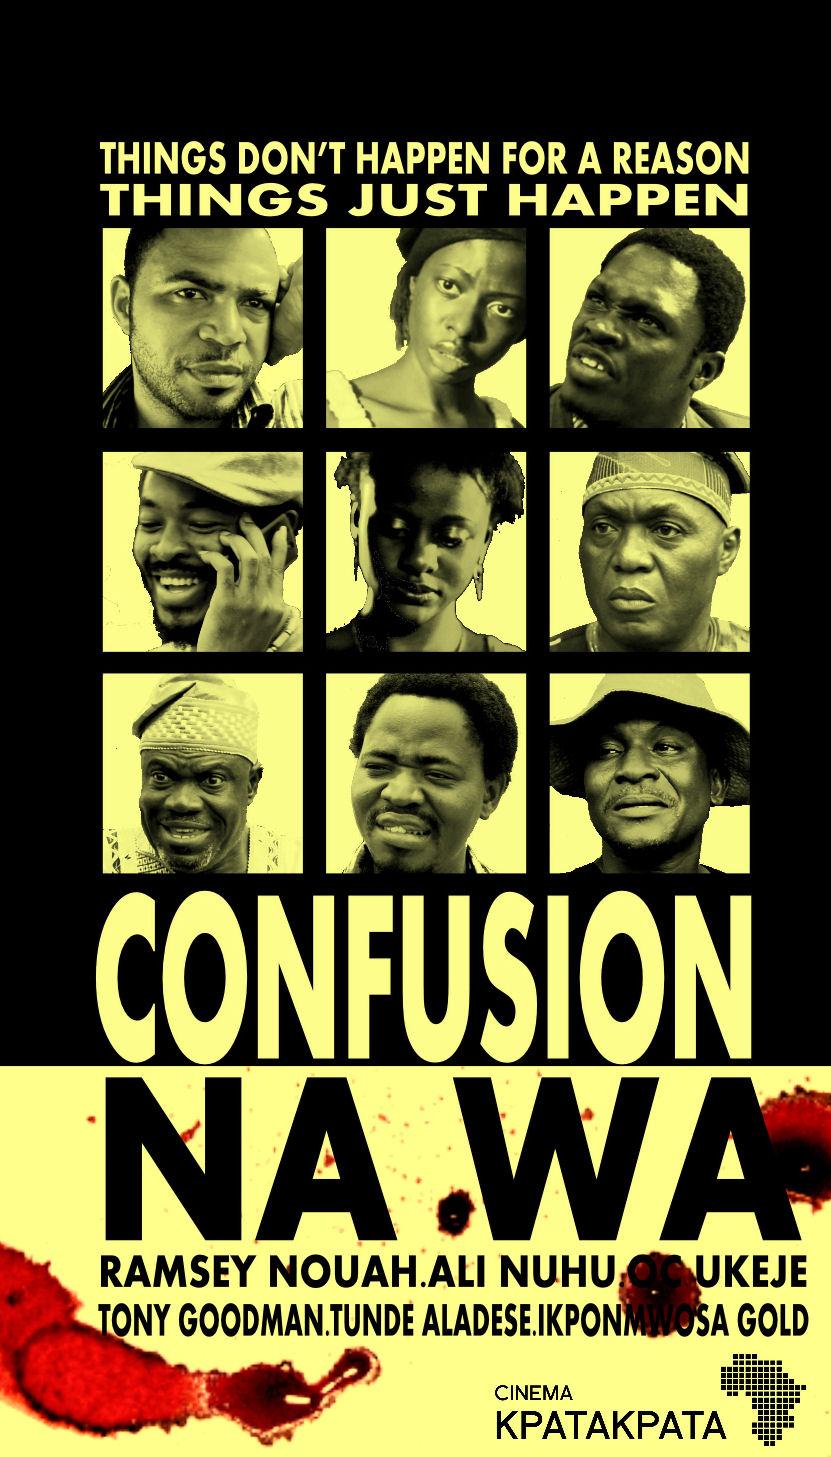 Africa Movie Academy Award for Best Makeup